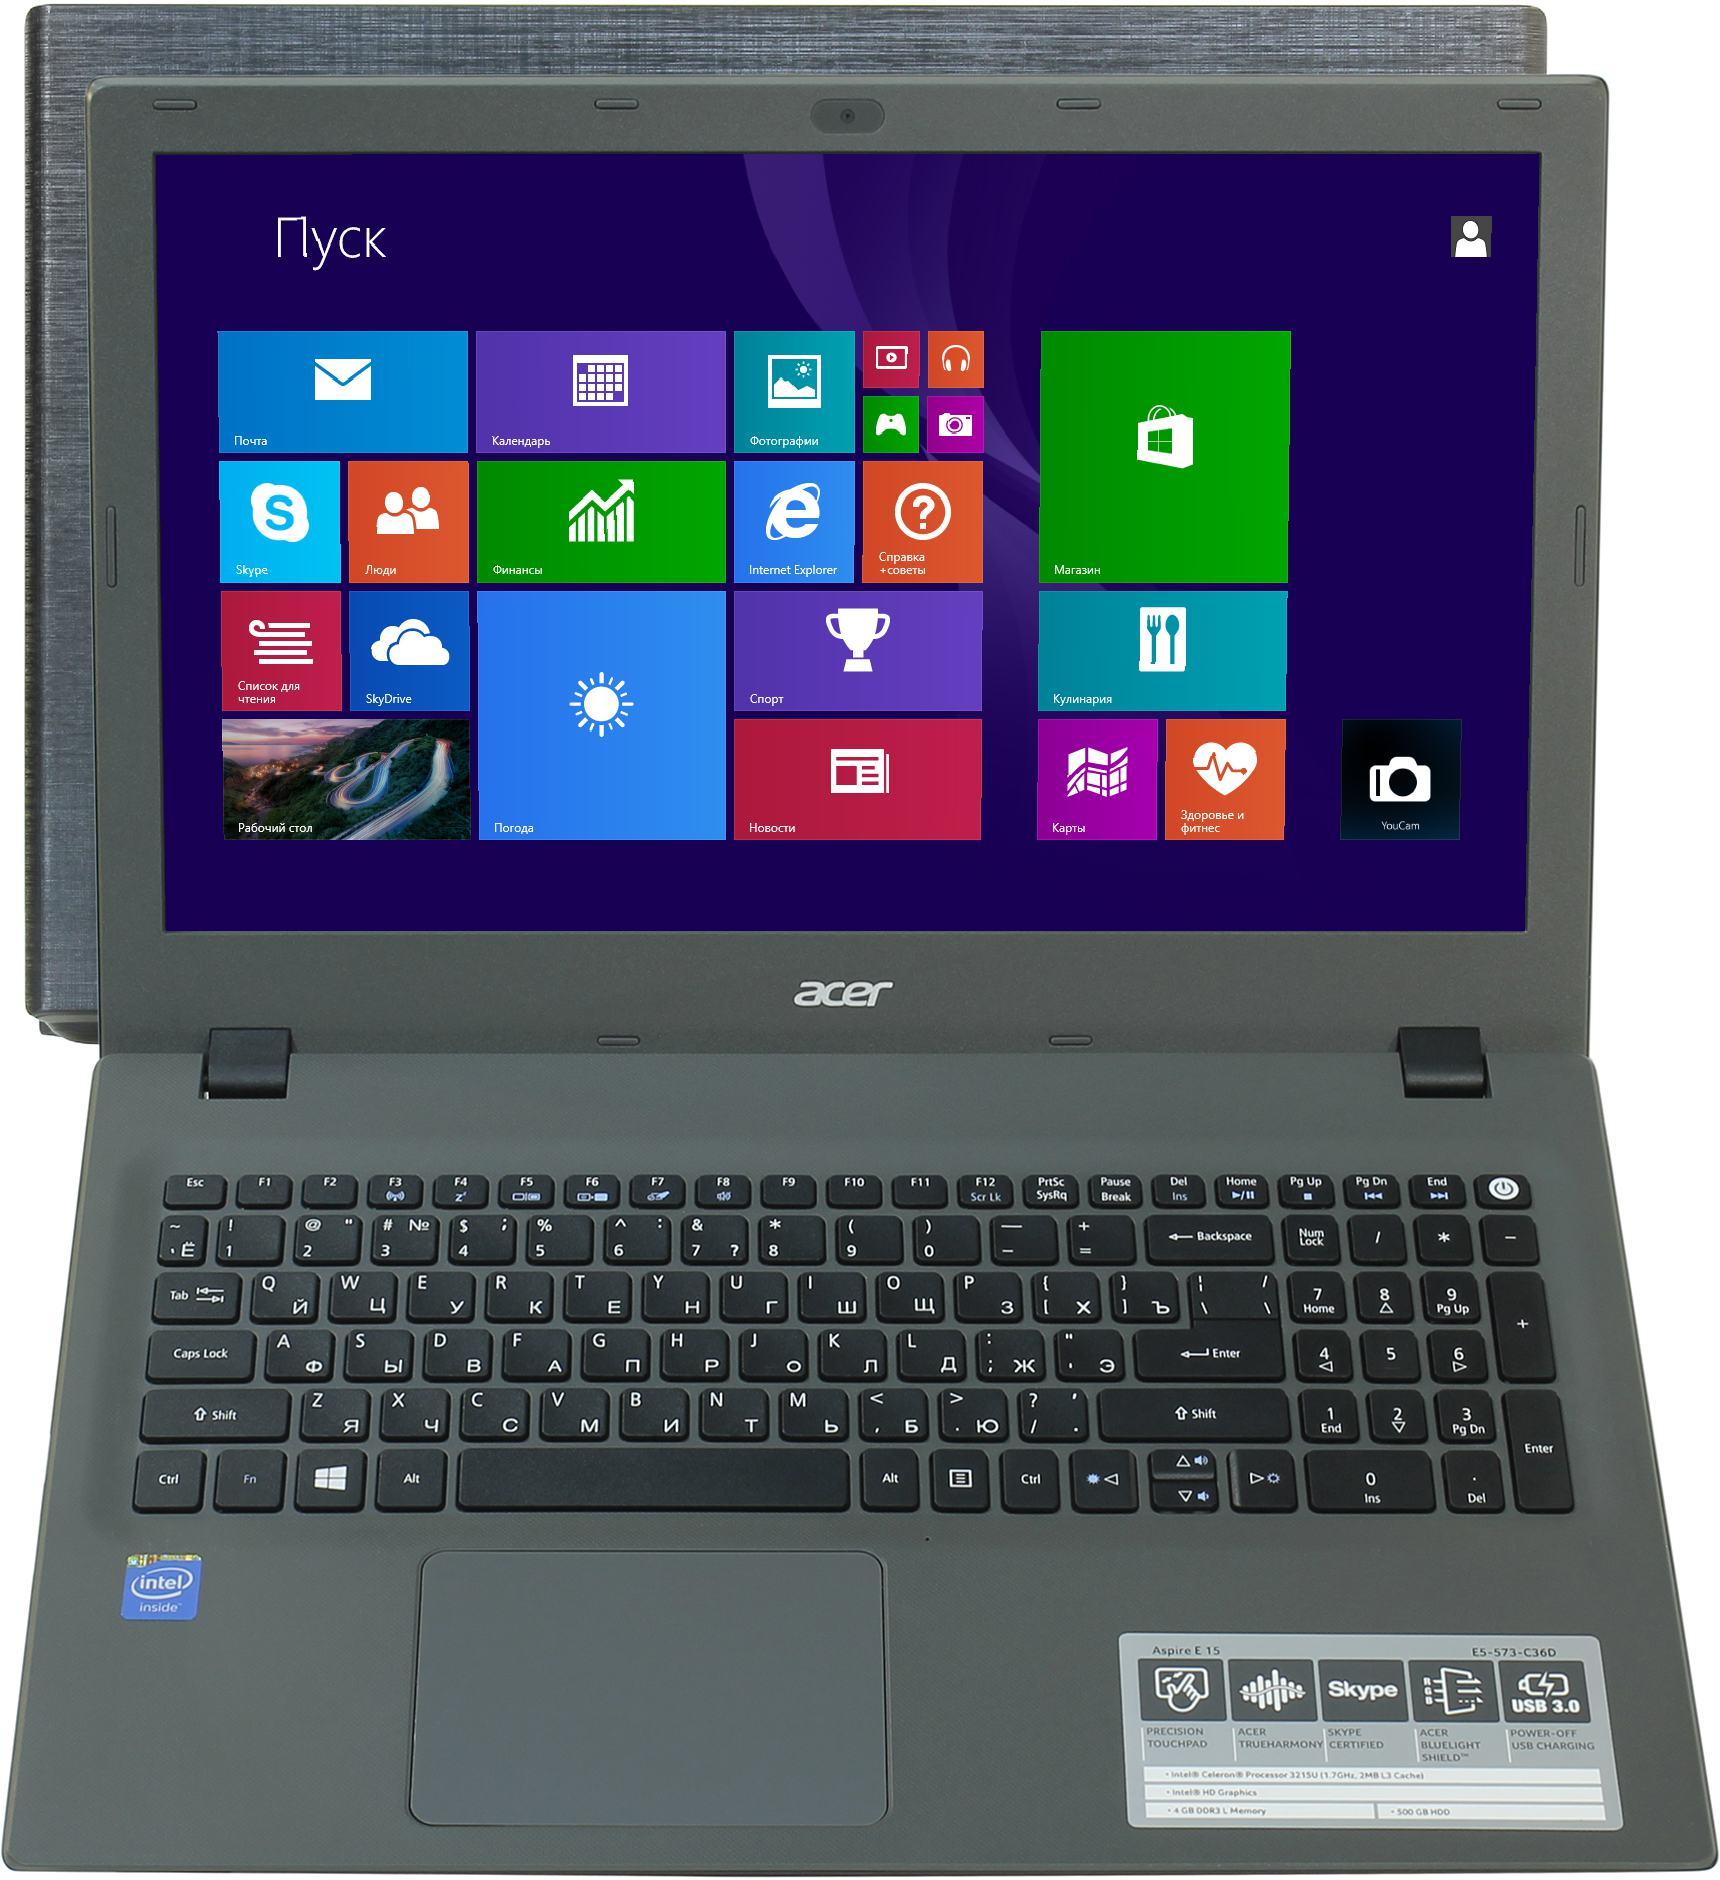 Acer Aspire 1610 WLAN Windows